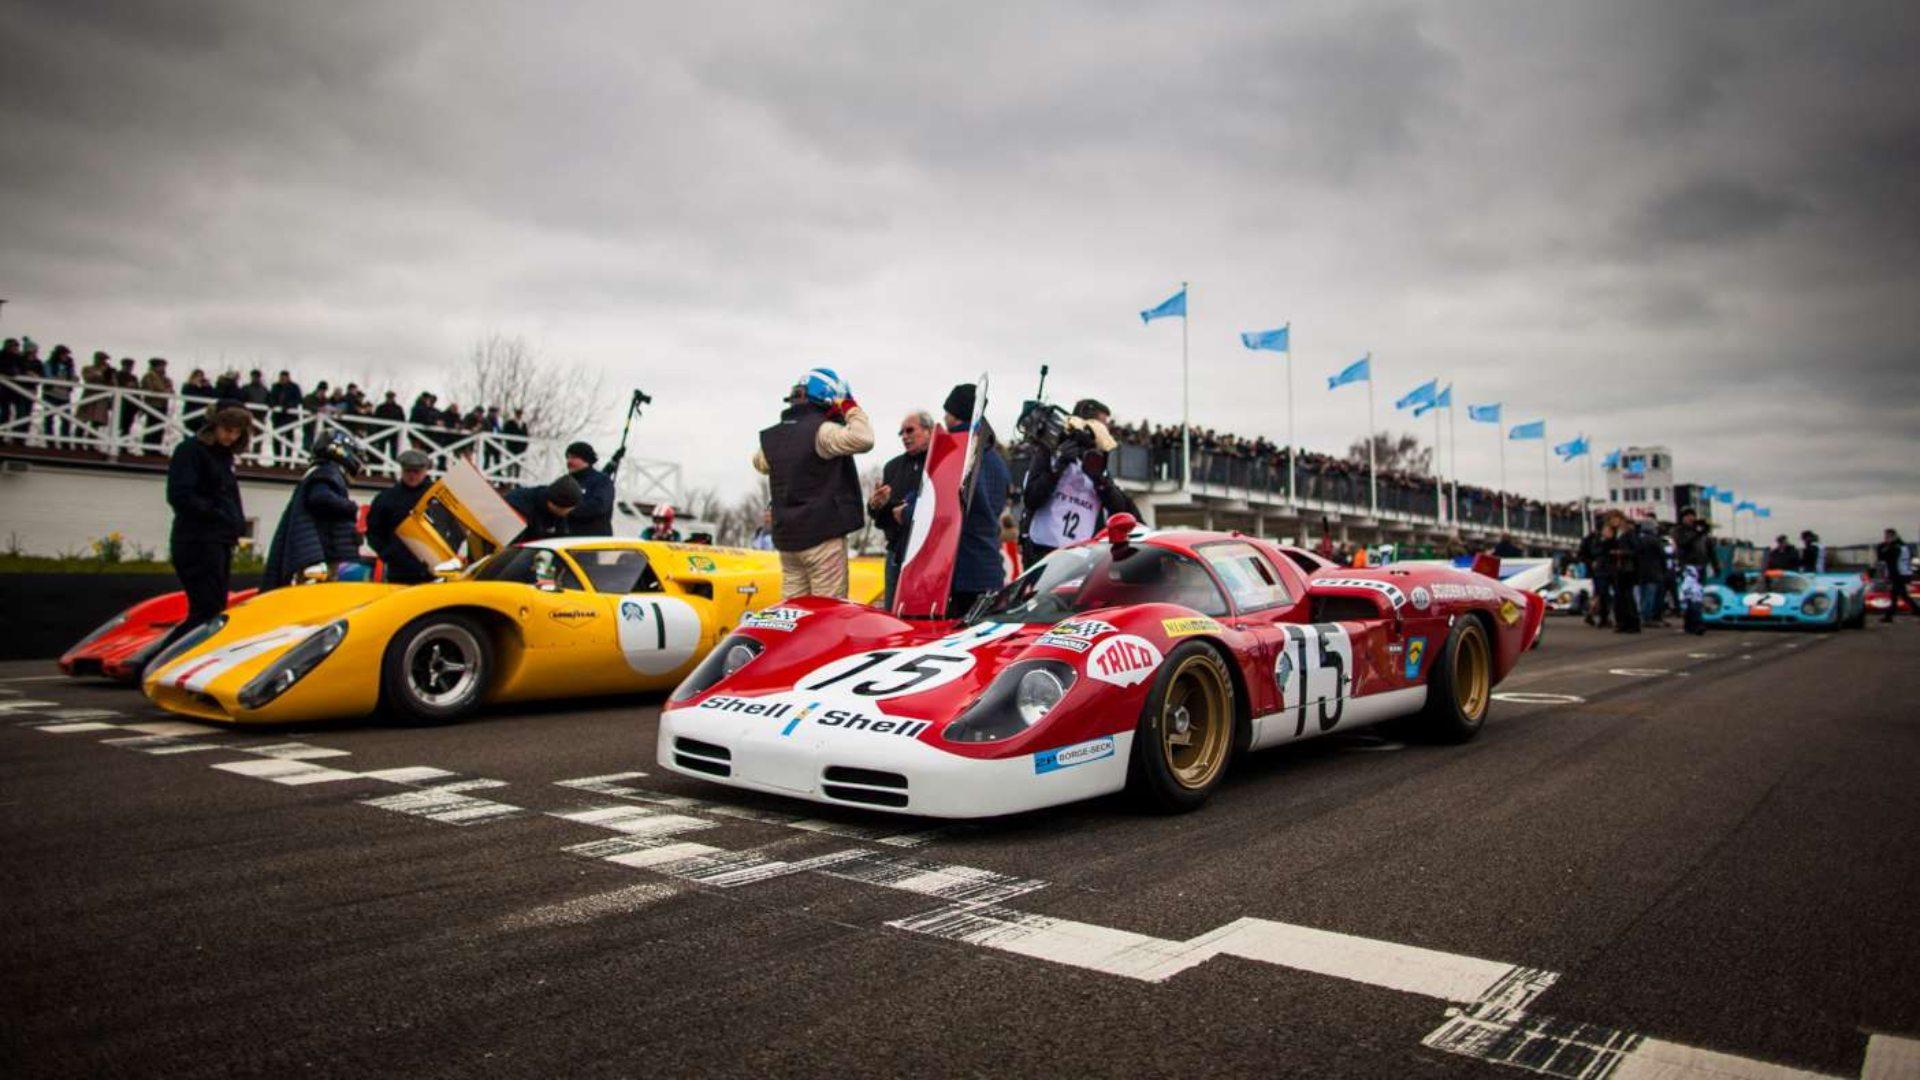 El Festival of Speed de Goodwood 2020 se pospone